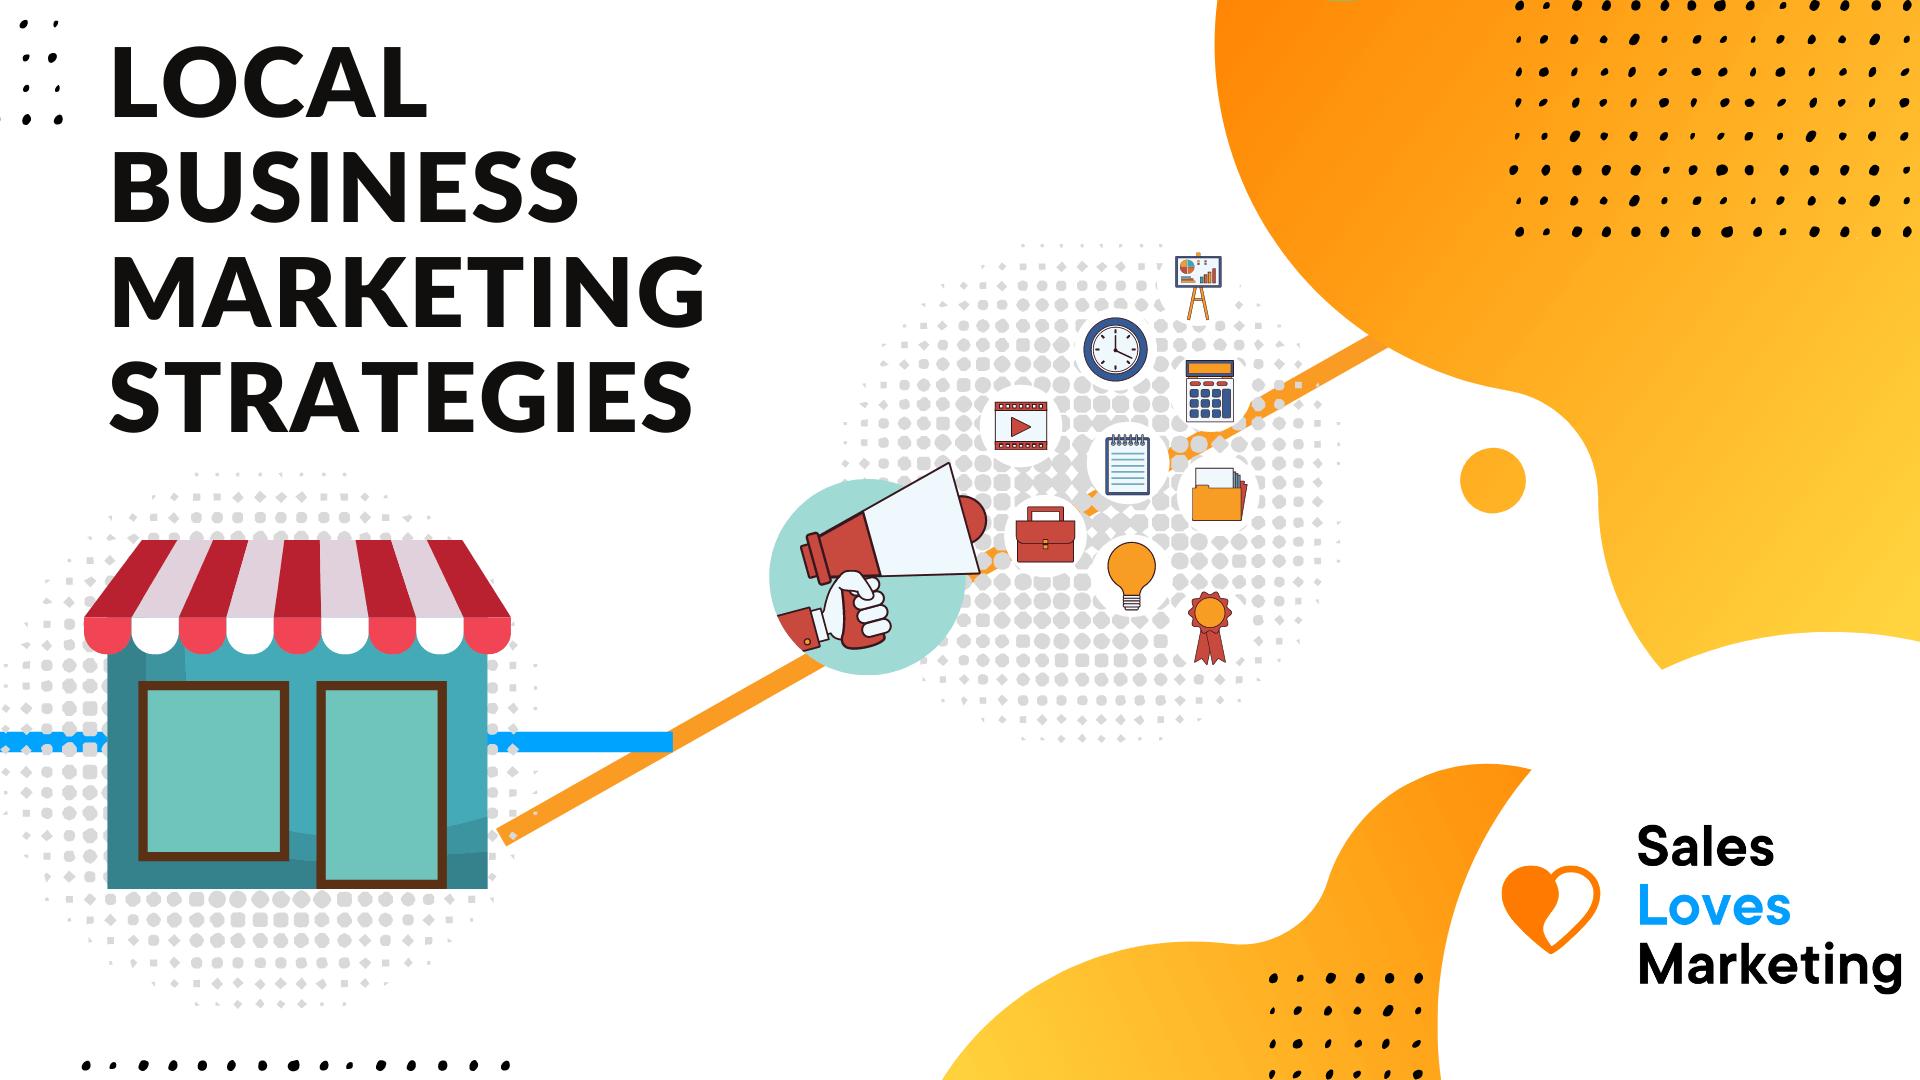 Local business marketing strategies